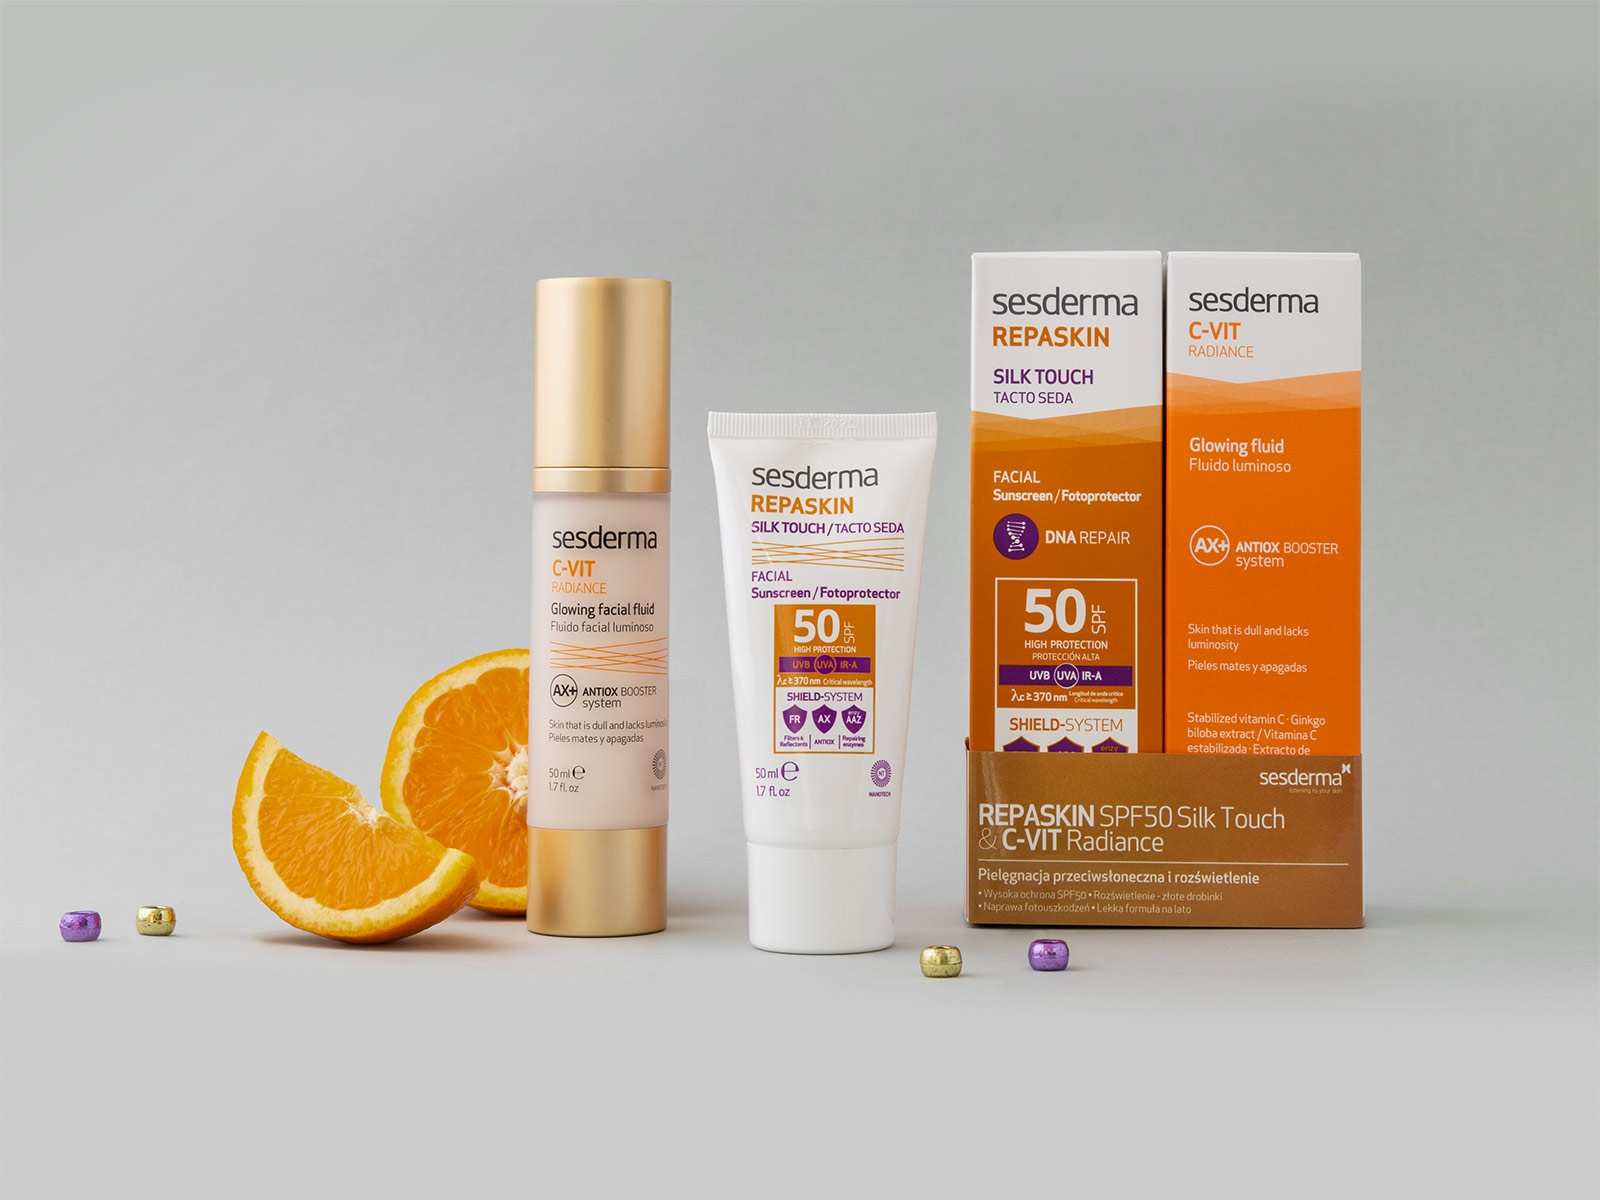 REPASKIN Silk Touch SPF50 + C-VIT Radiance krem 50 ml + 50 ml